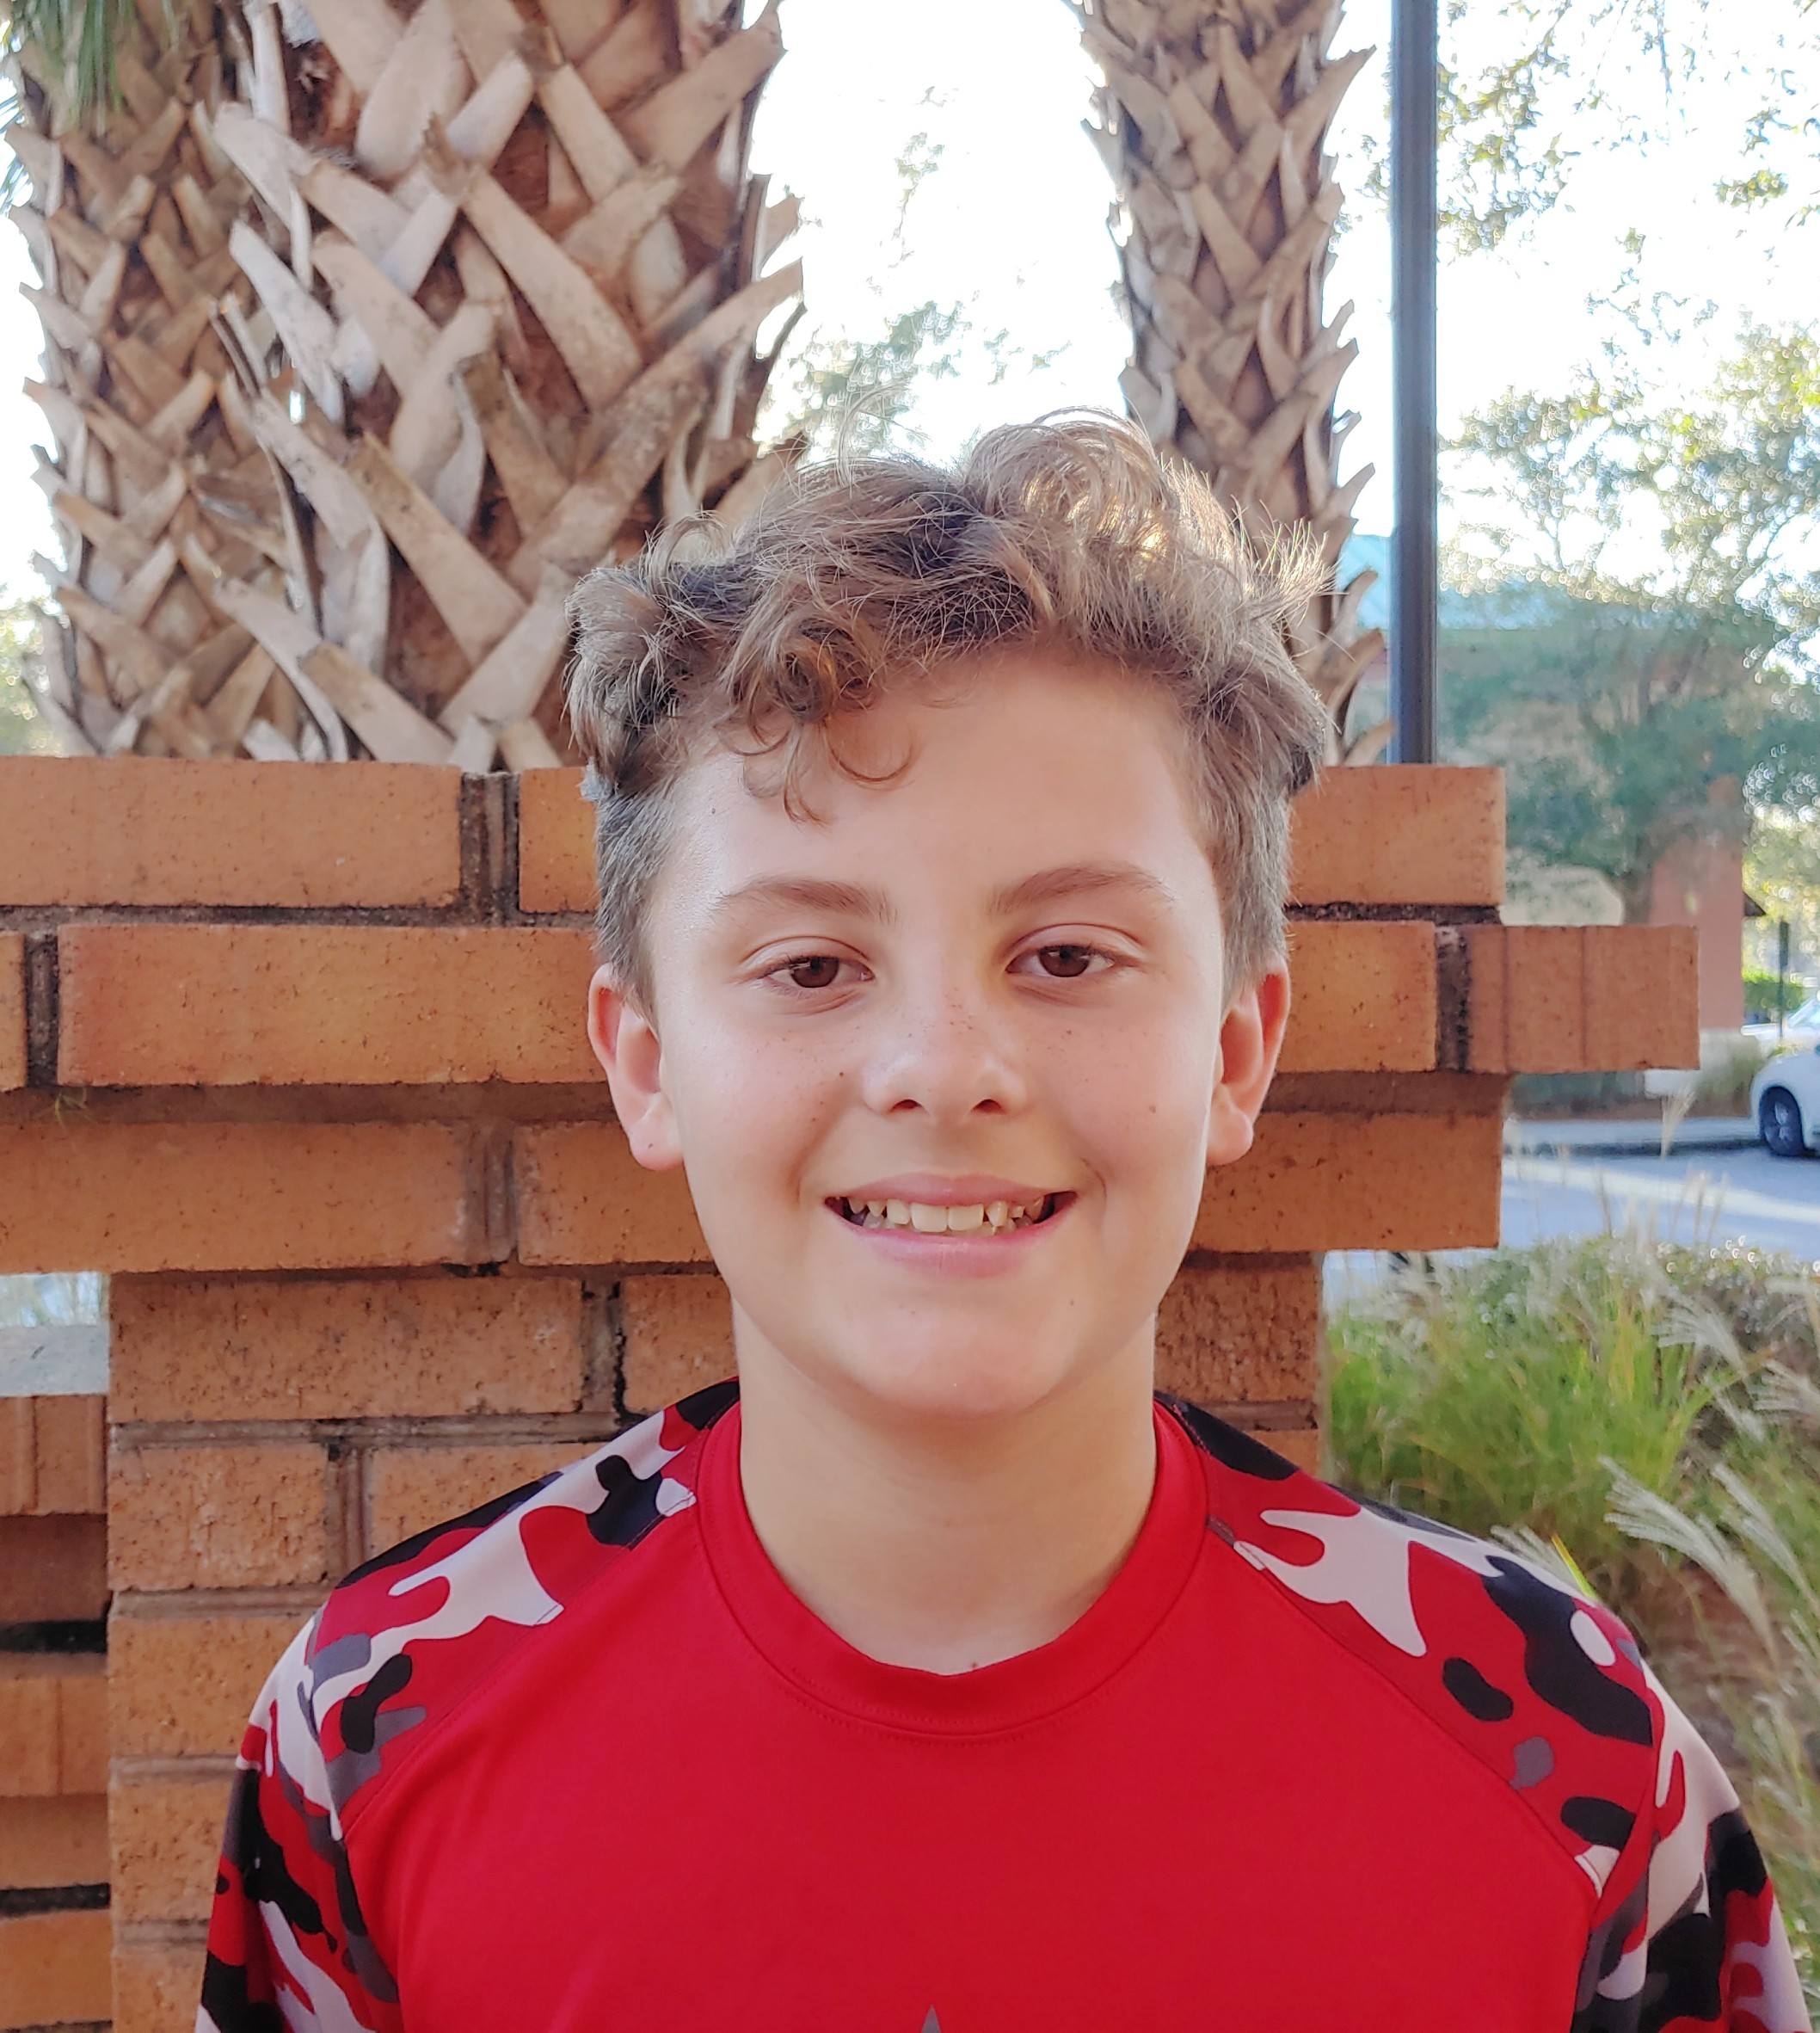 I would want a bike because I need a new bike and mine is too small.  Ryan, age 10  Daniel Island